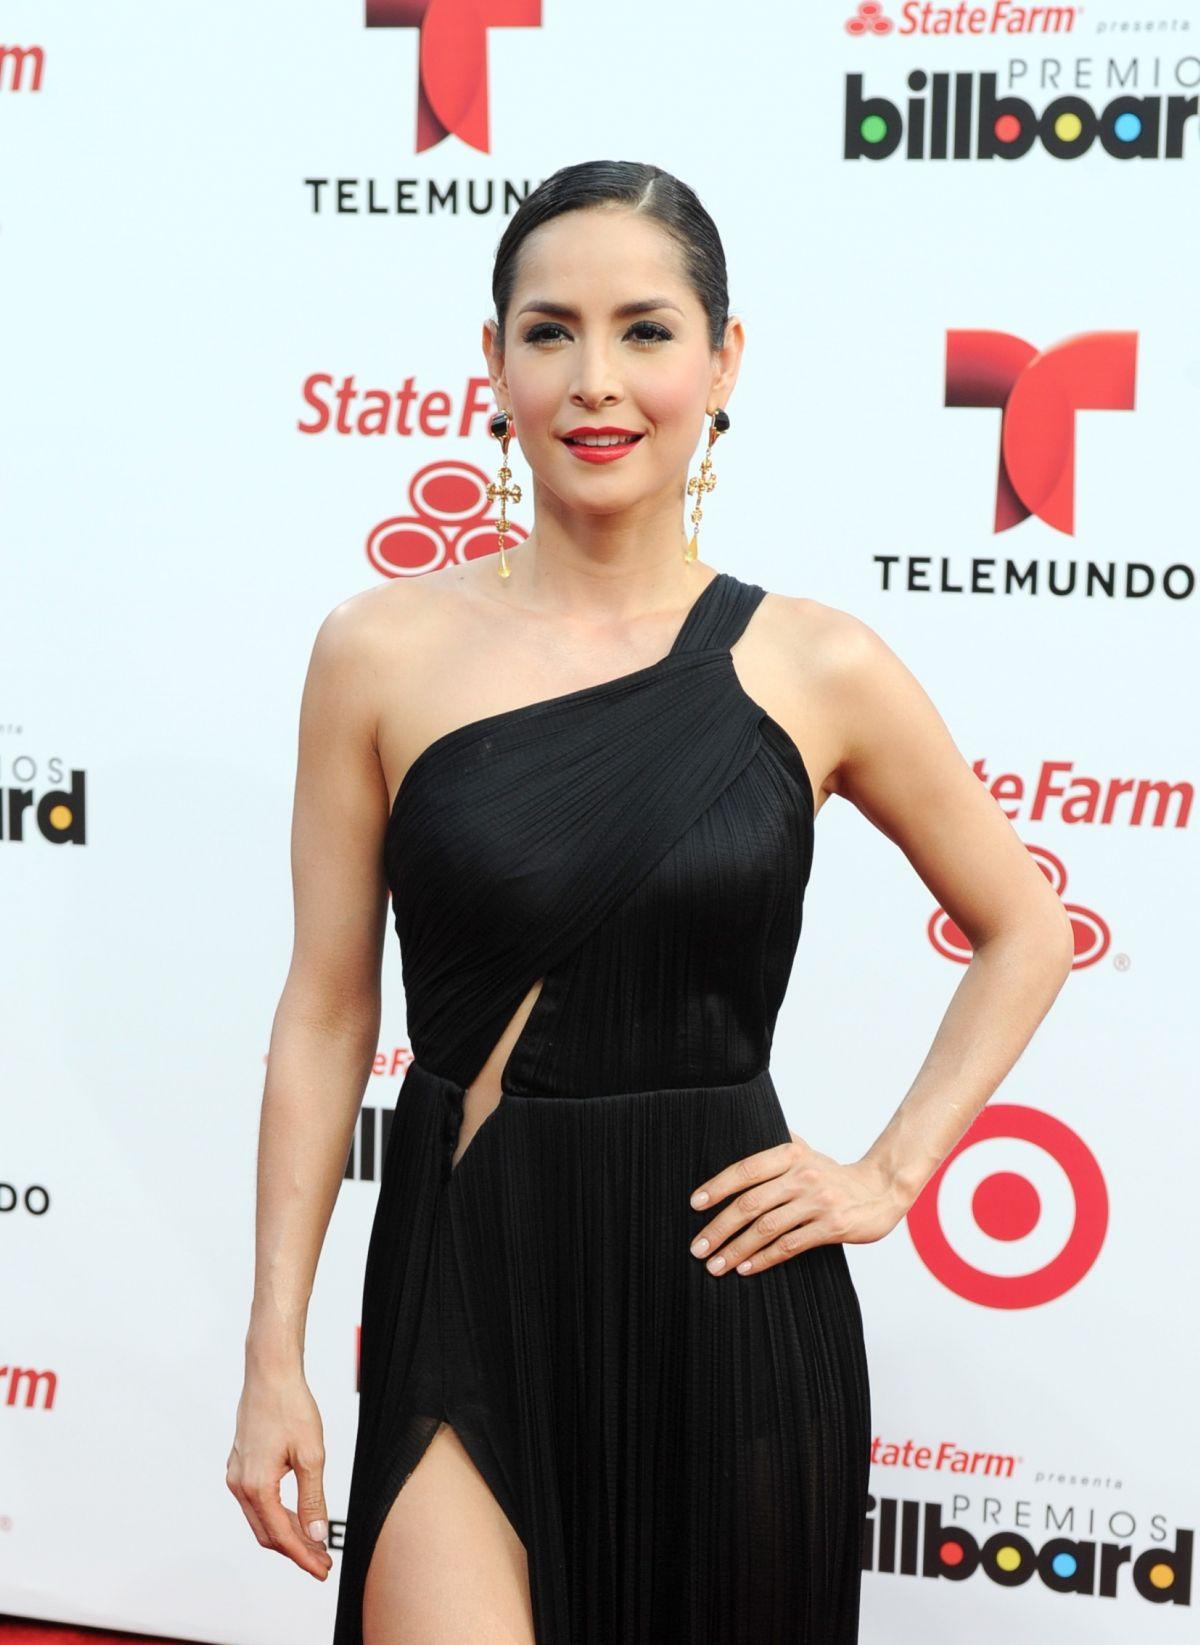 CARMEN VILLALOBOS at 2014 Billboard Latin Music Awards in Miami